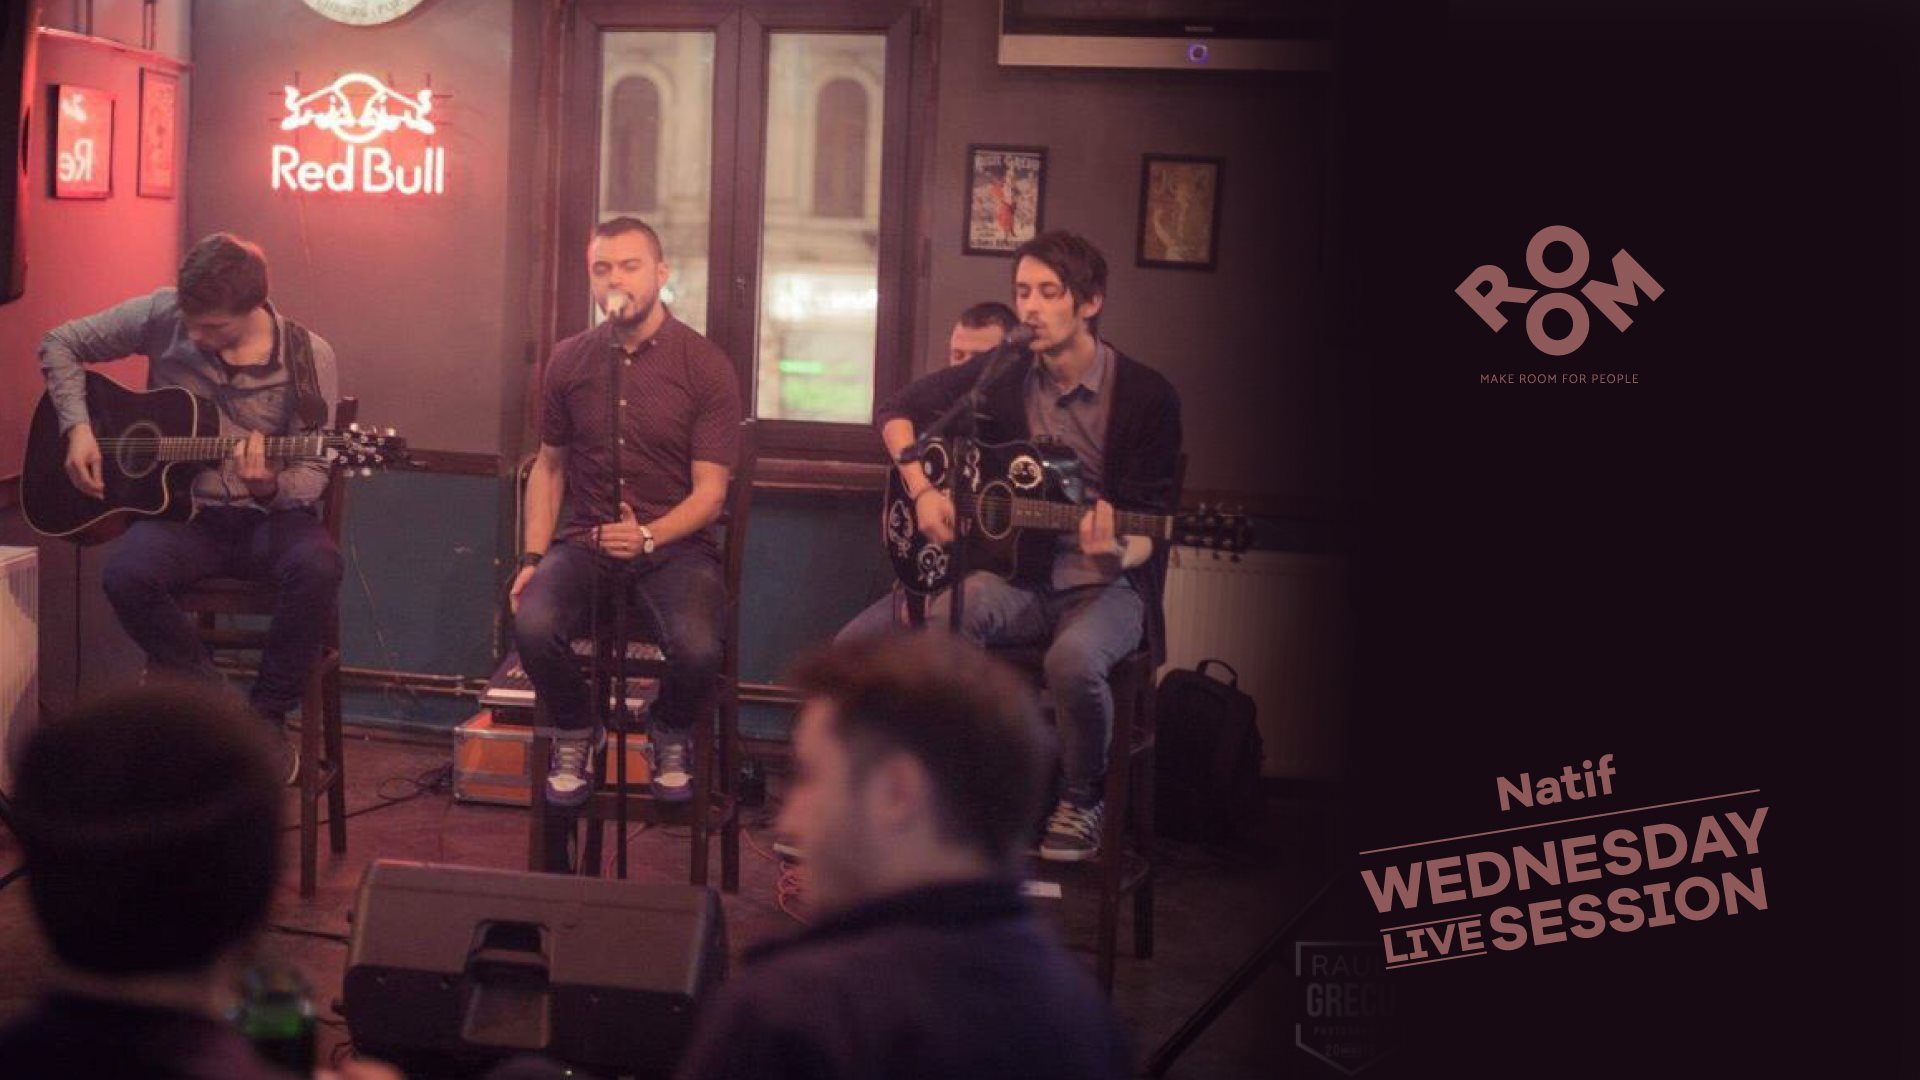 Wednesday Live Session | Natif